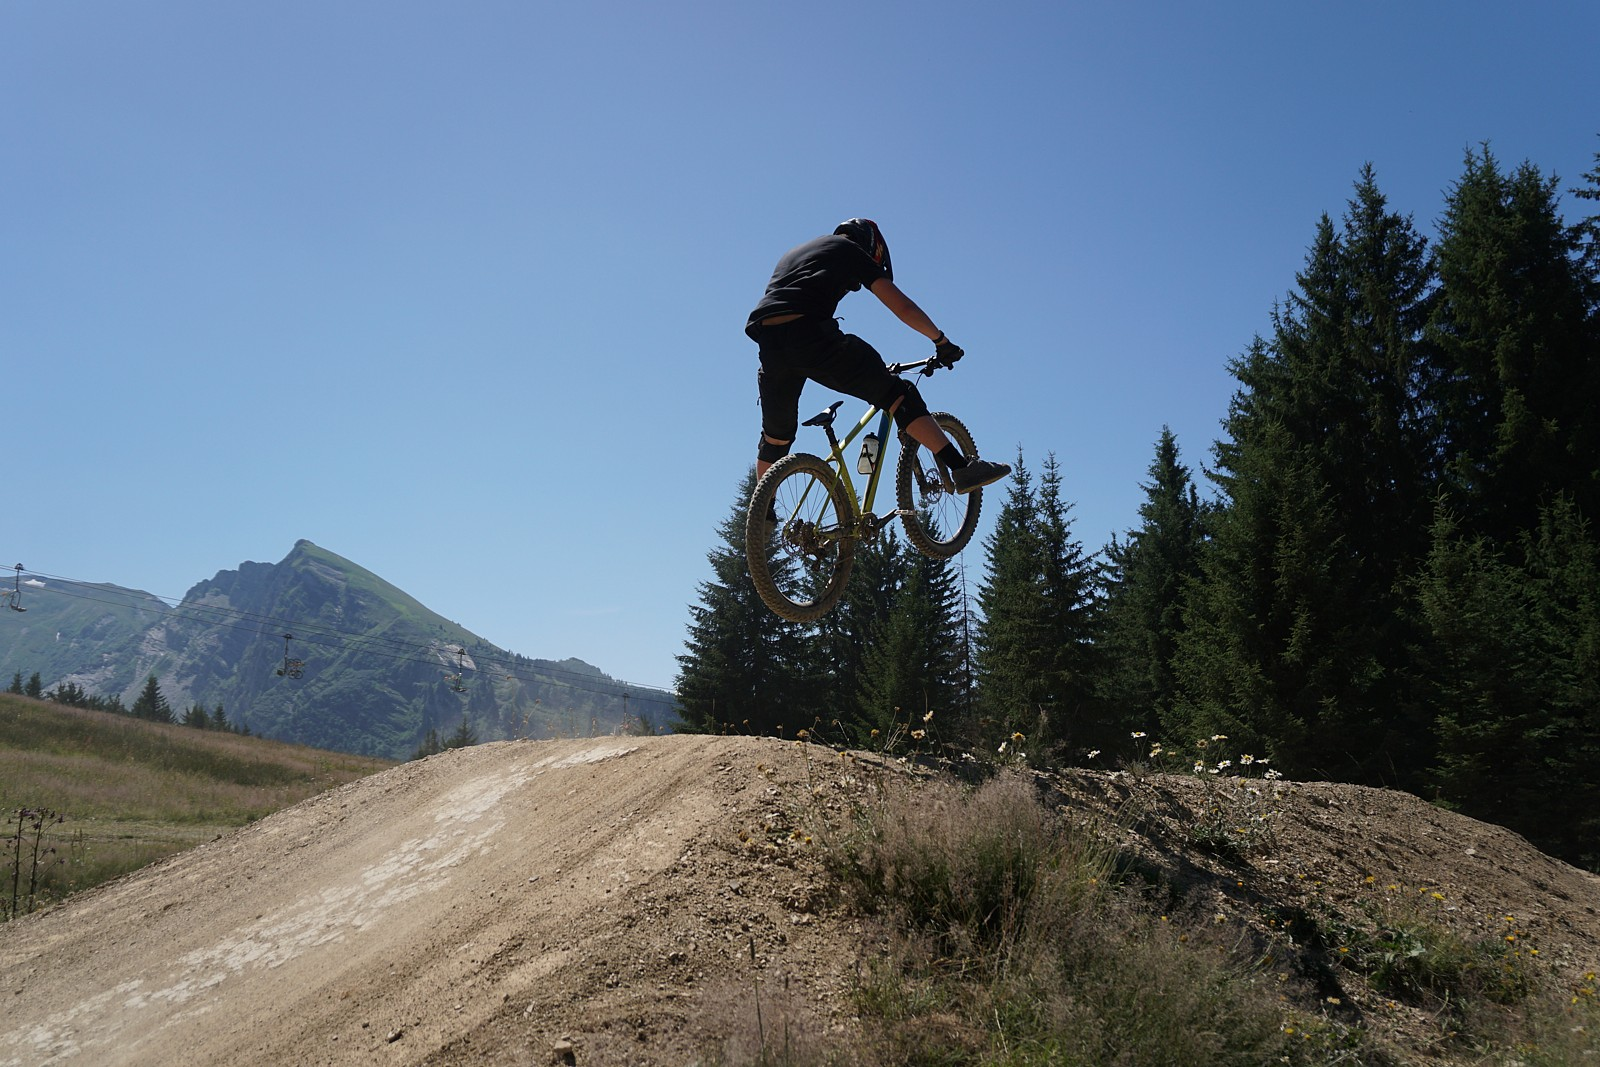 DSC08481 - c1c51 - Mountain Biking Pictures - Vital MTB